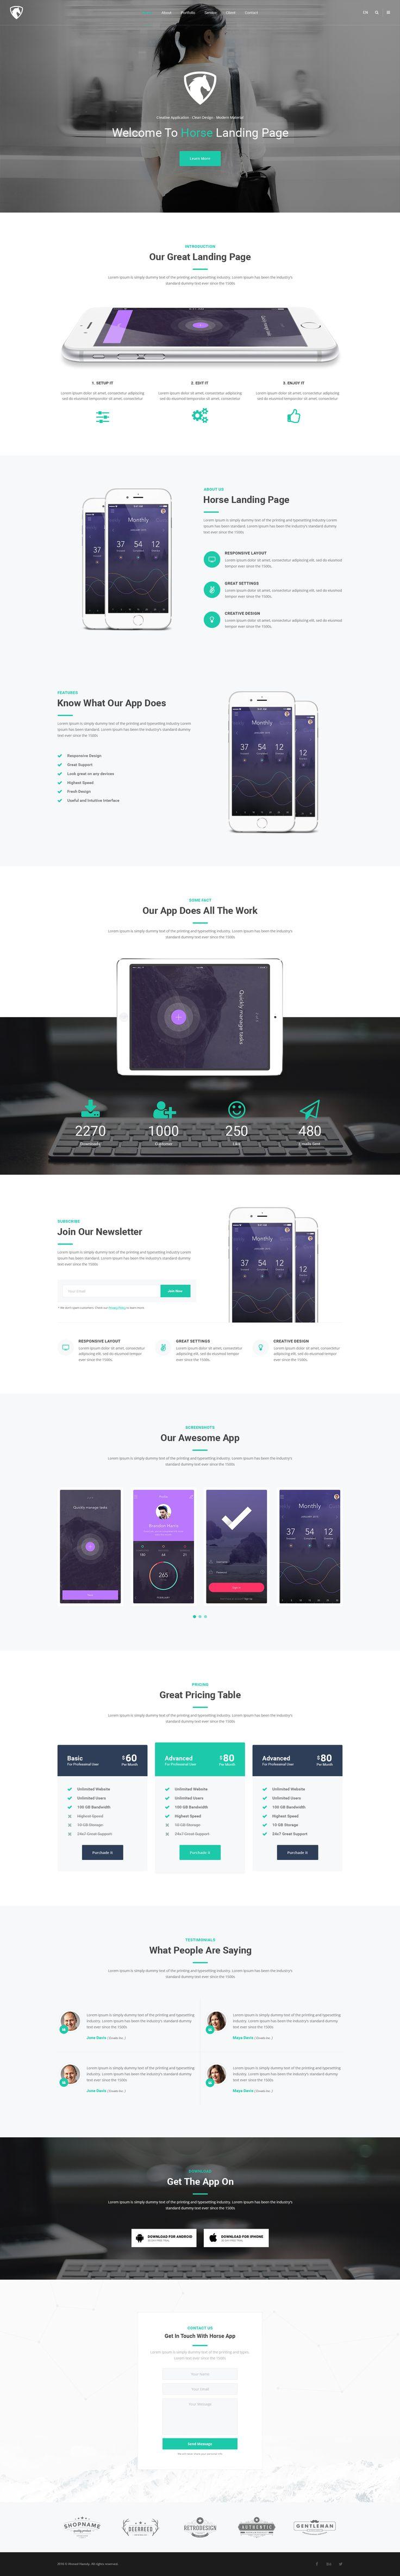 Horse App - PSD Template #psd #application #creative • Download ➝ https://themeforest.net/item/horse-app-psd-template/18729902?ref=pxcr